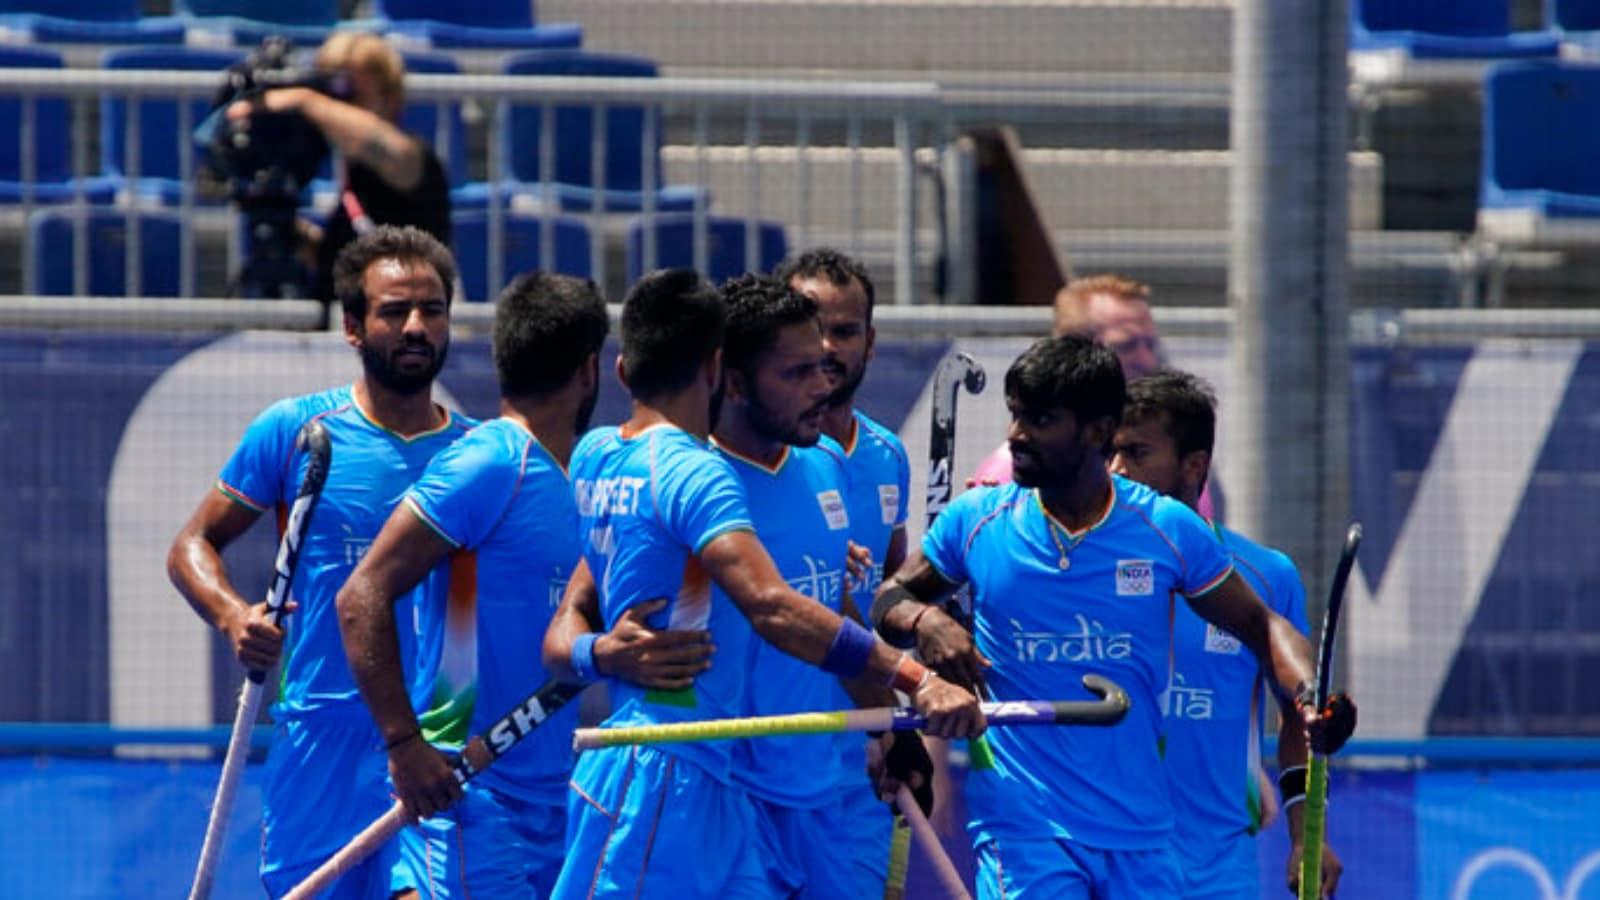 India vs Belgium Hockey Highlights, Tokyo Olympics 2020, Semi-Final: India Lose 2-5, Bronze Medal Still Up for Grabs